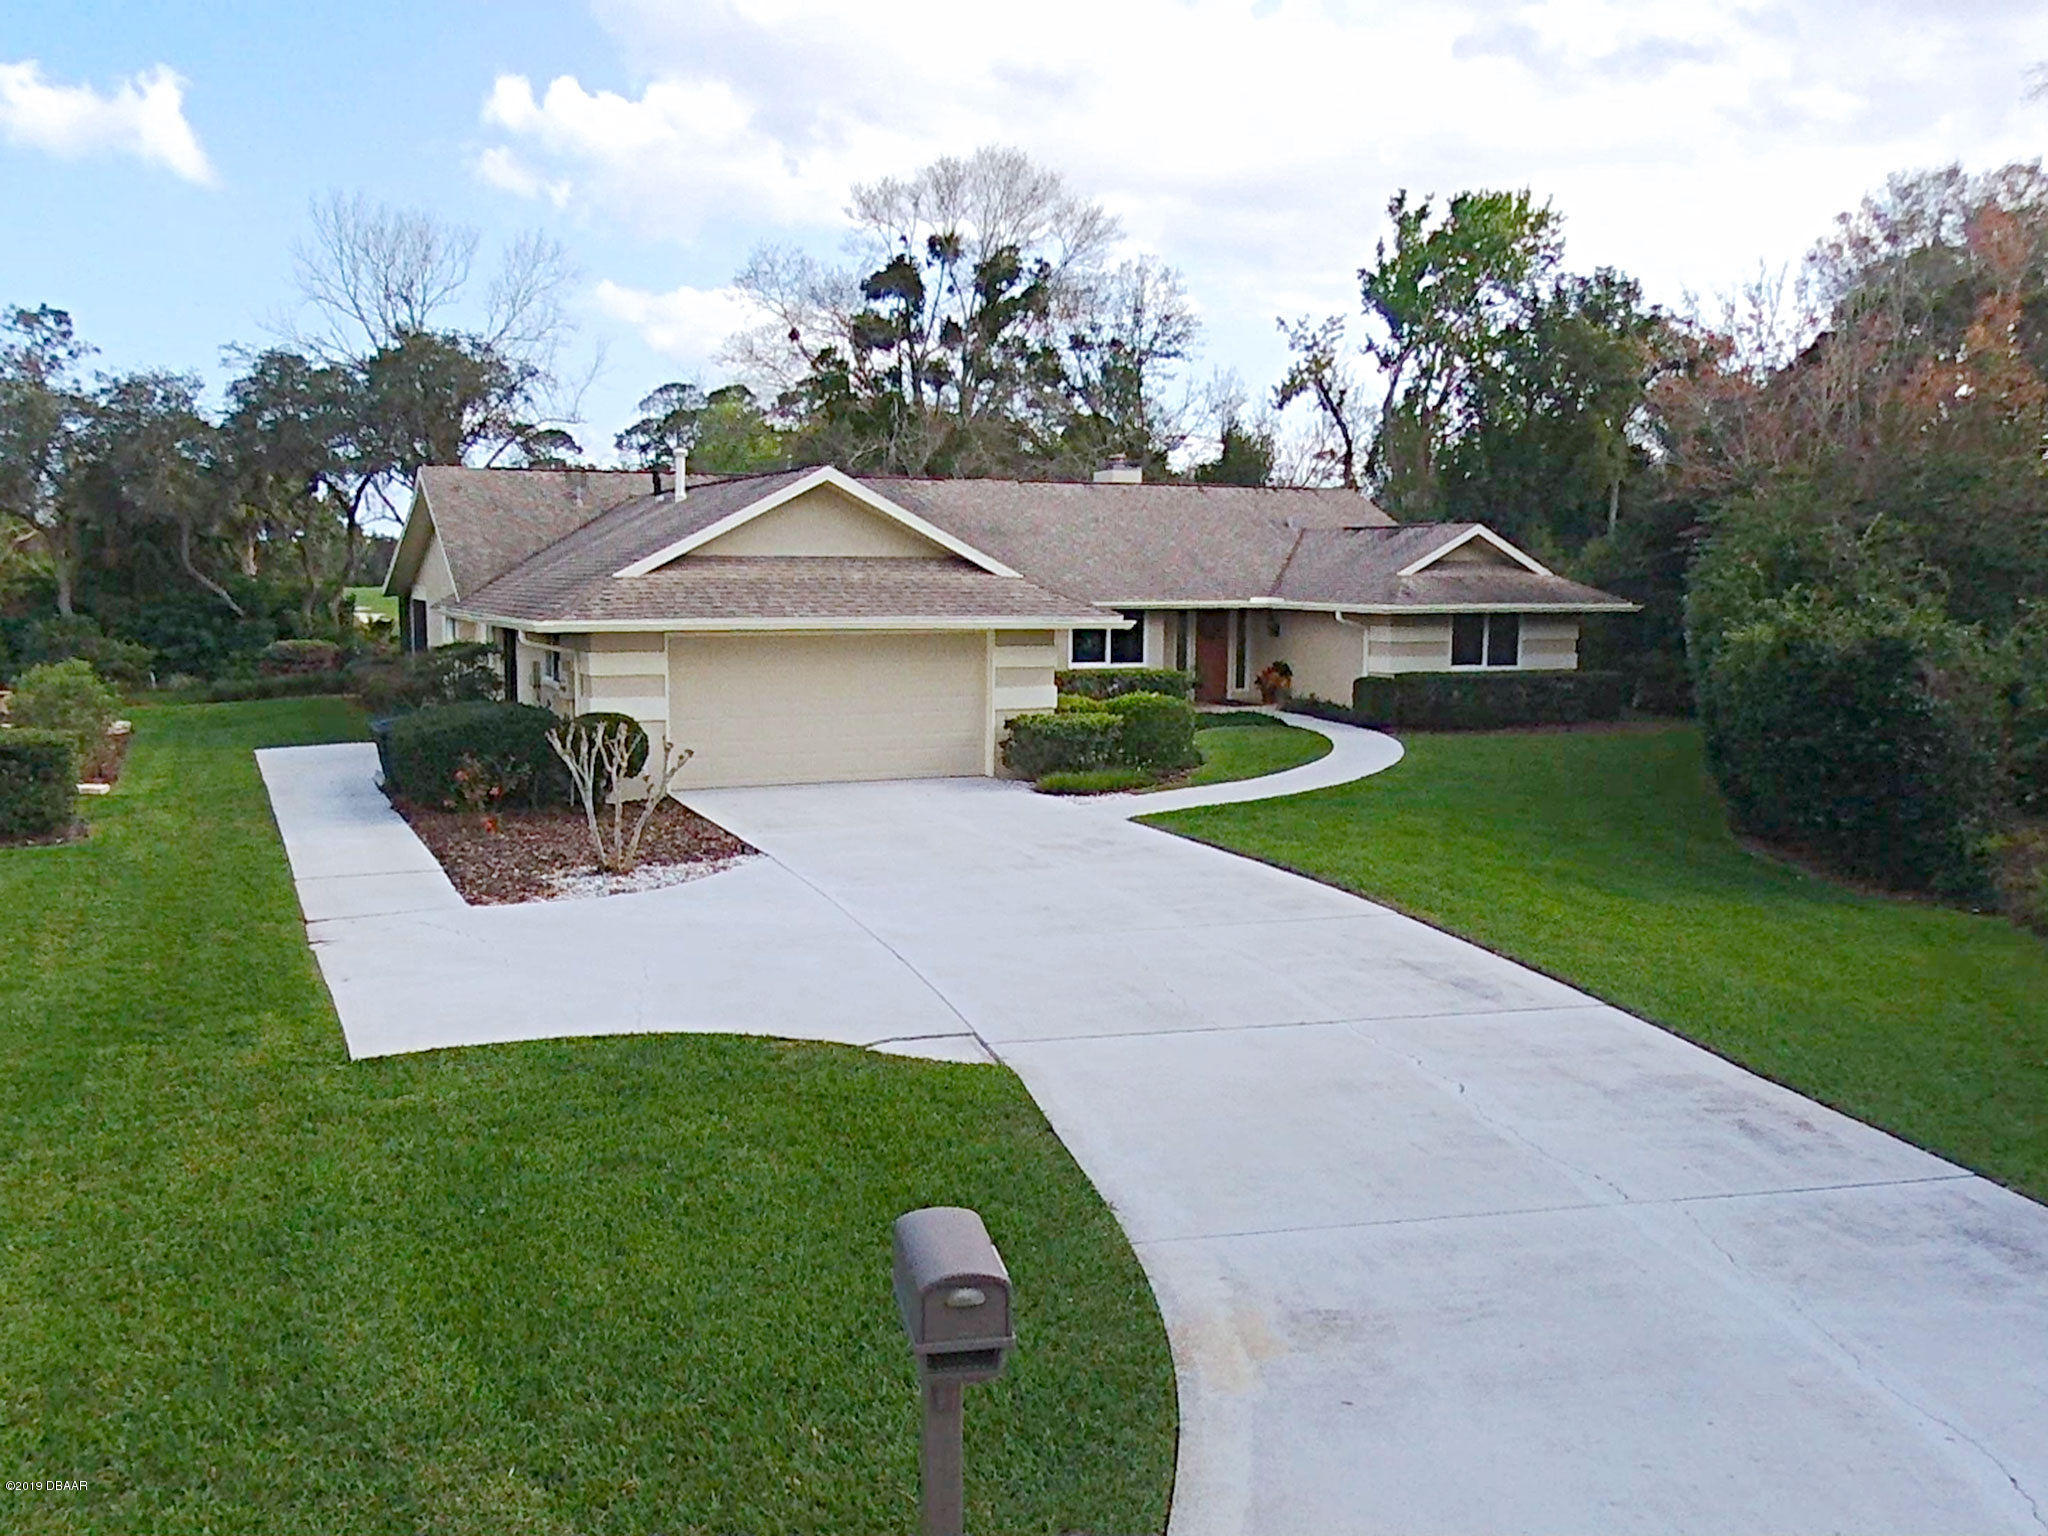 Photo of 910 Arrowroot Court, New Smyrna Beach, FL 32168